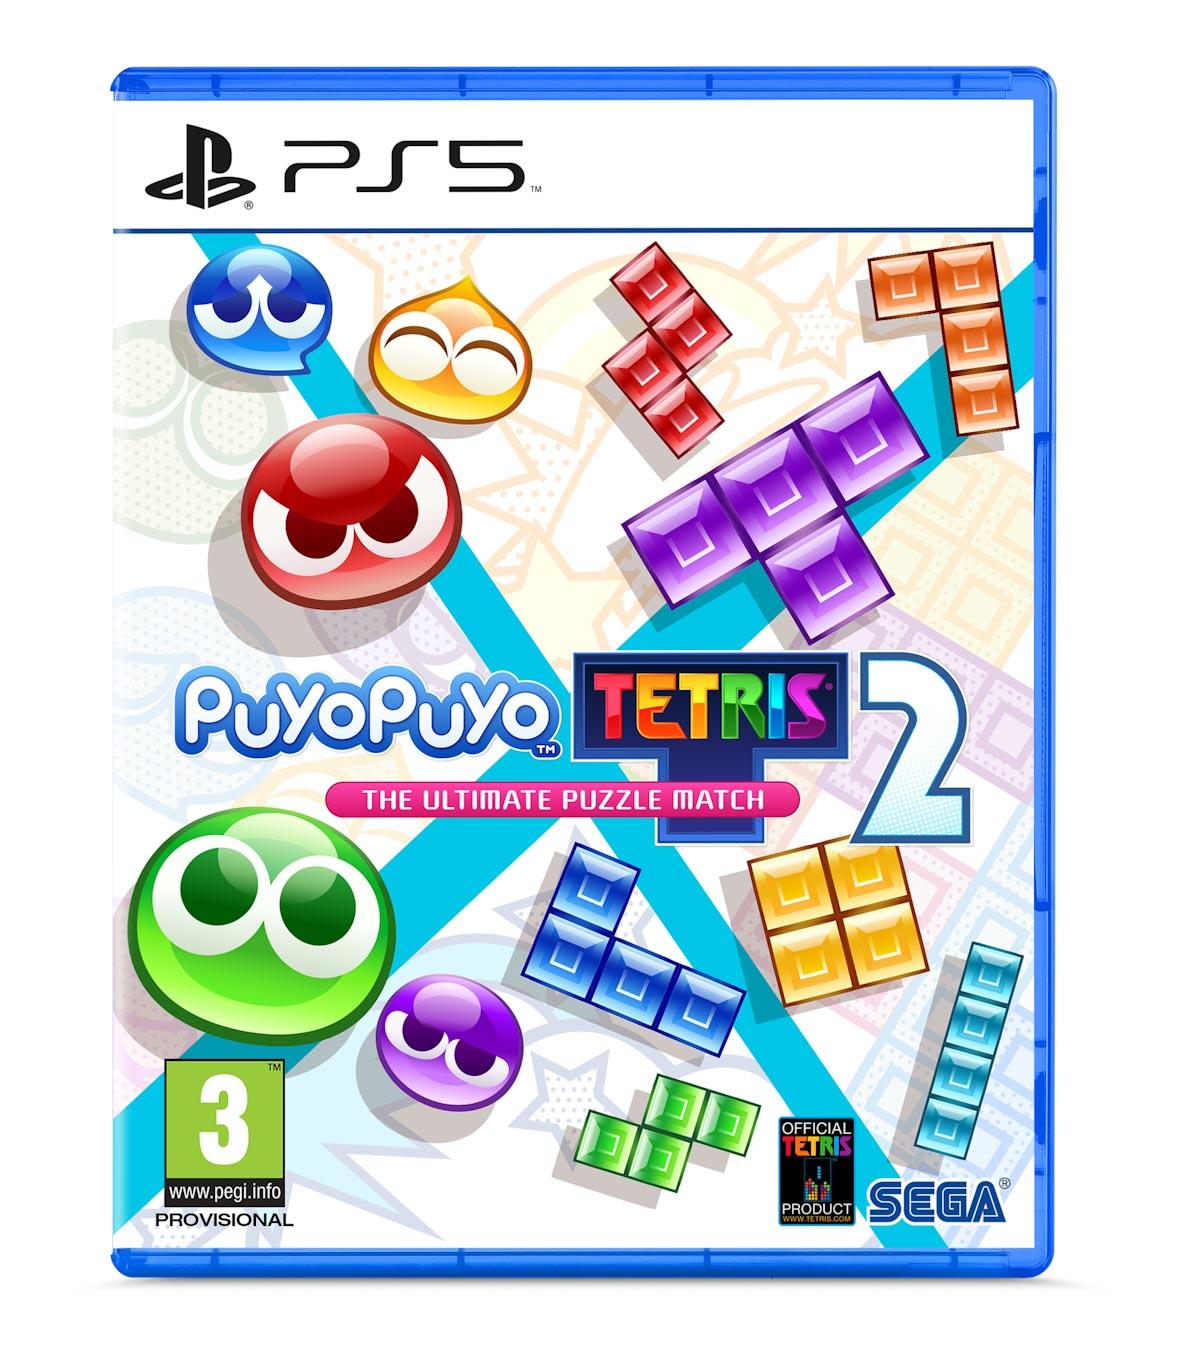 Puyo Puyo Tetris 2 PS5 - SEGA 1.11.01.01.008